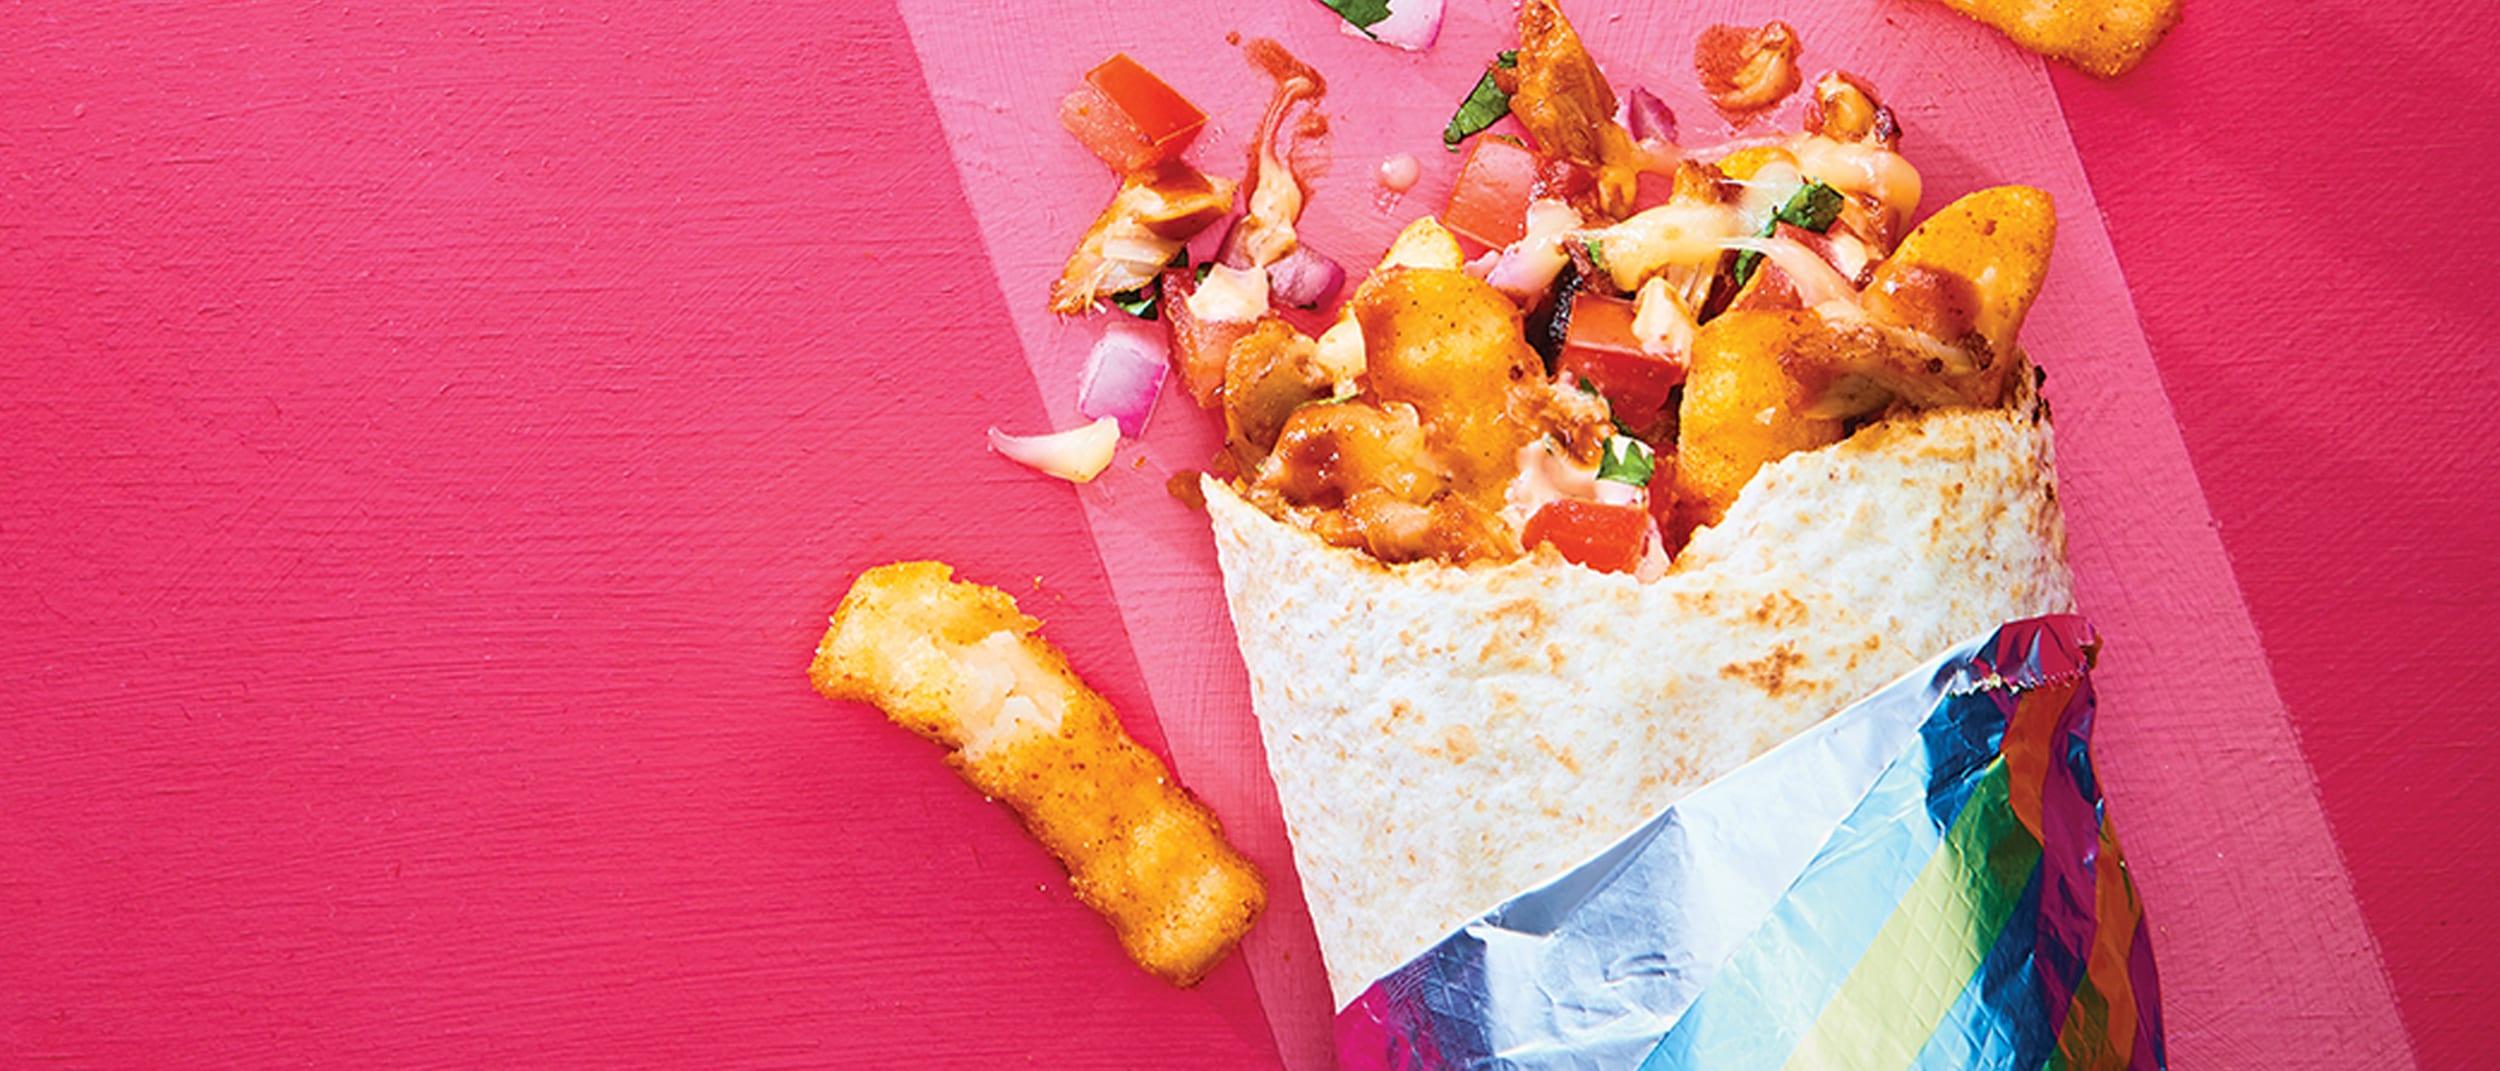 Salsa's Fresh Mex Grill: Chip-Burrito is back